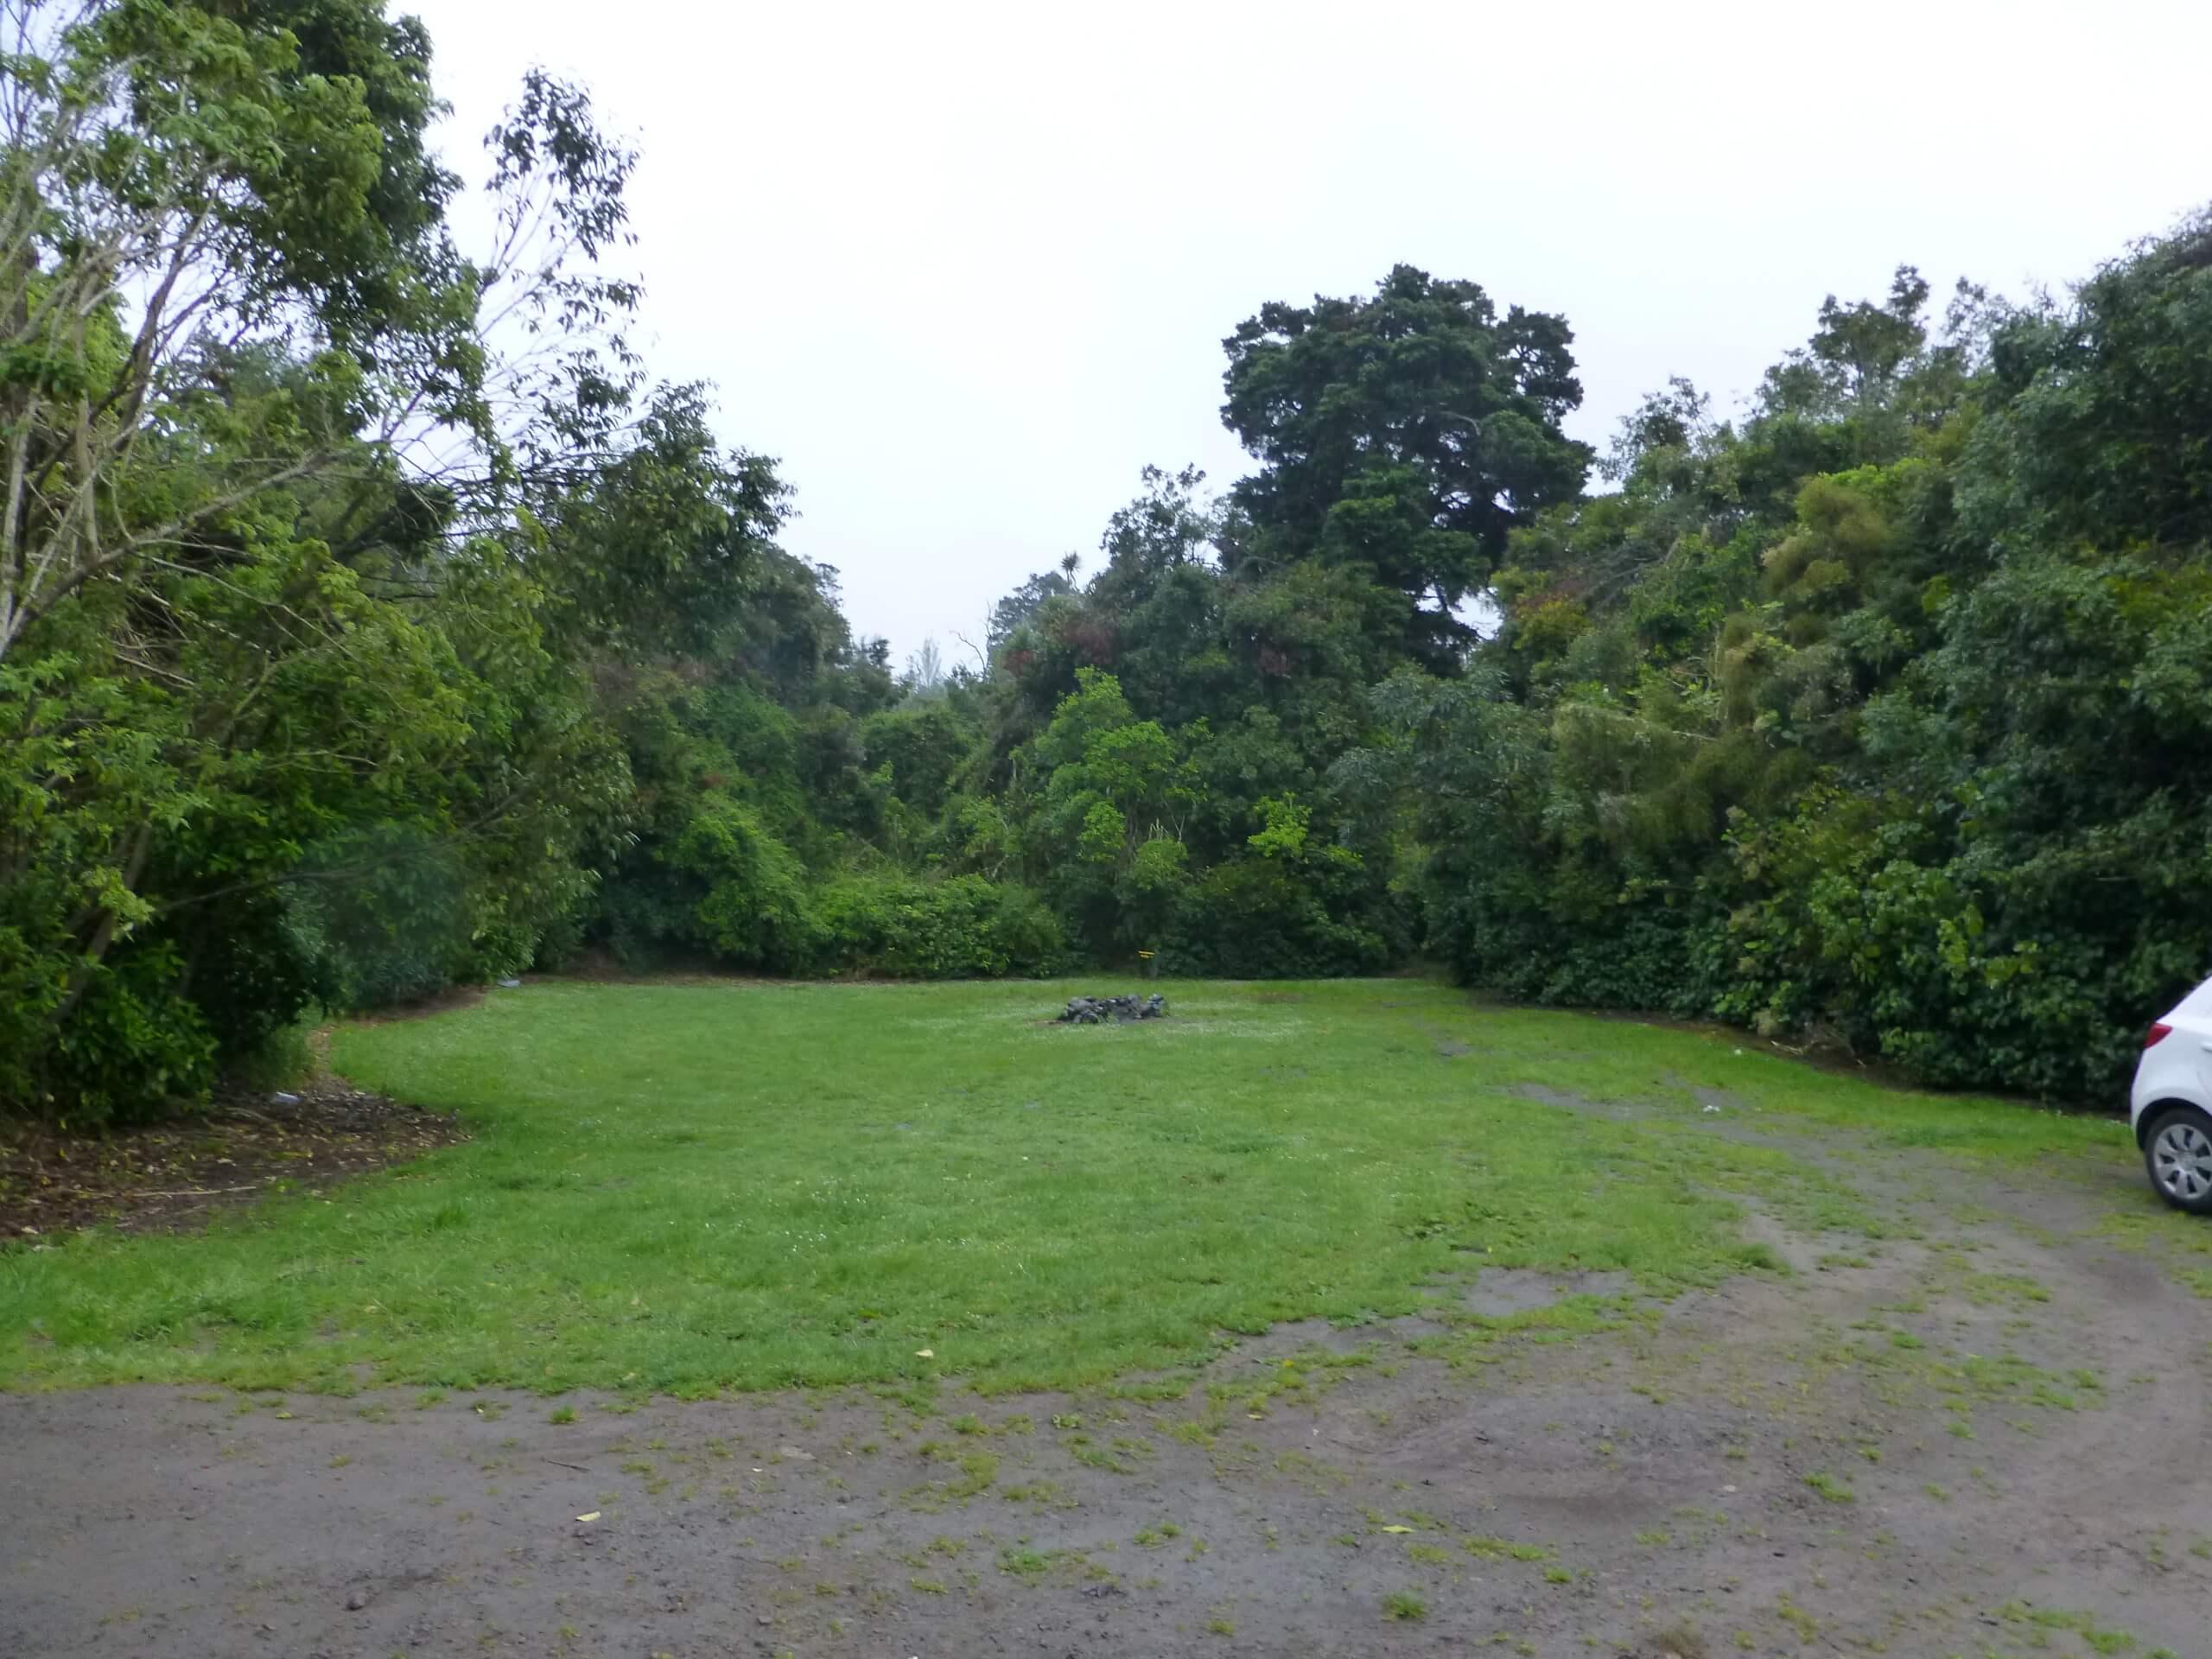 Campingplatz, PiriPiri 3, Weit weg reisen